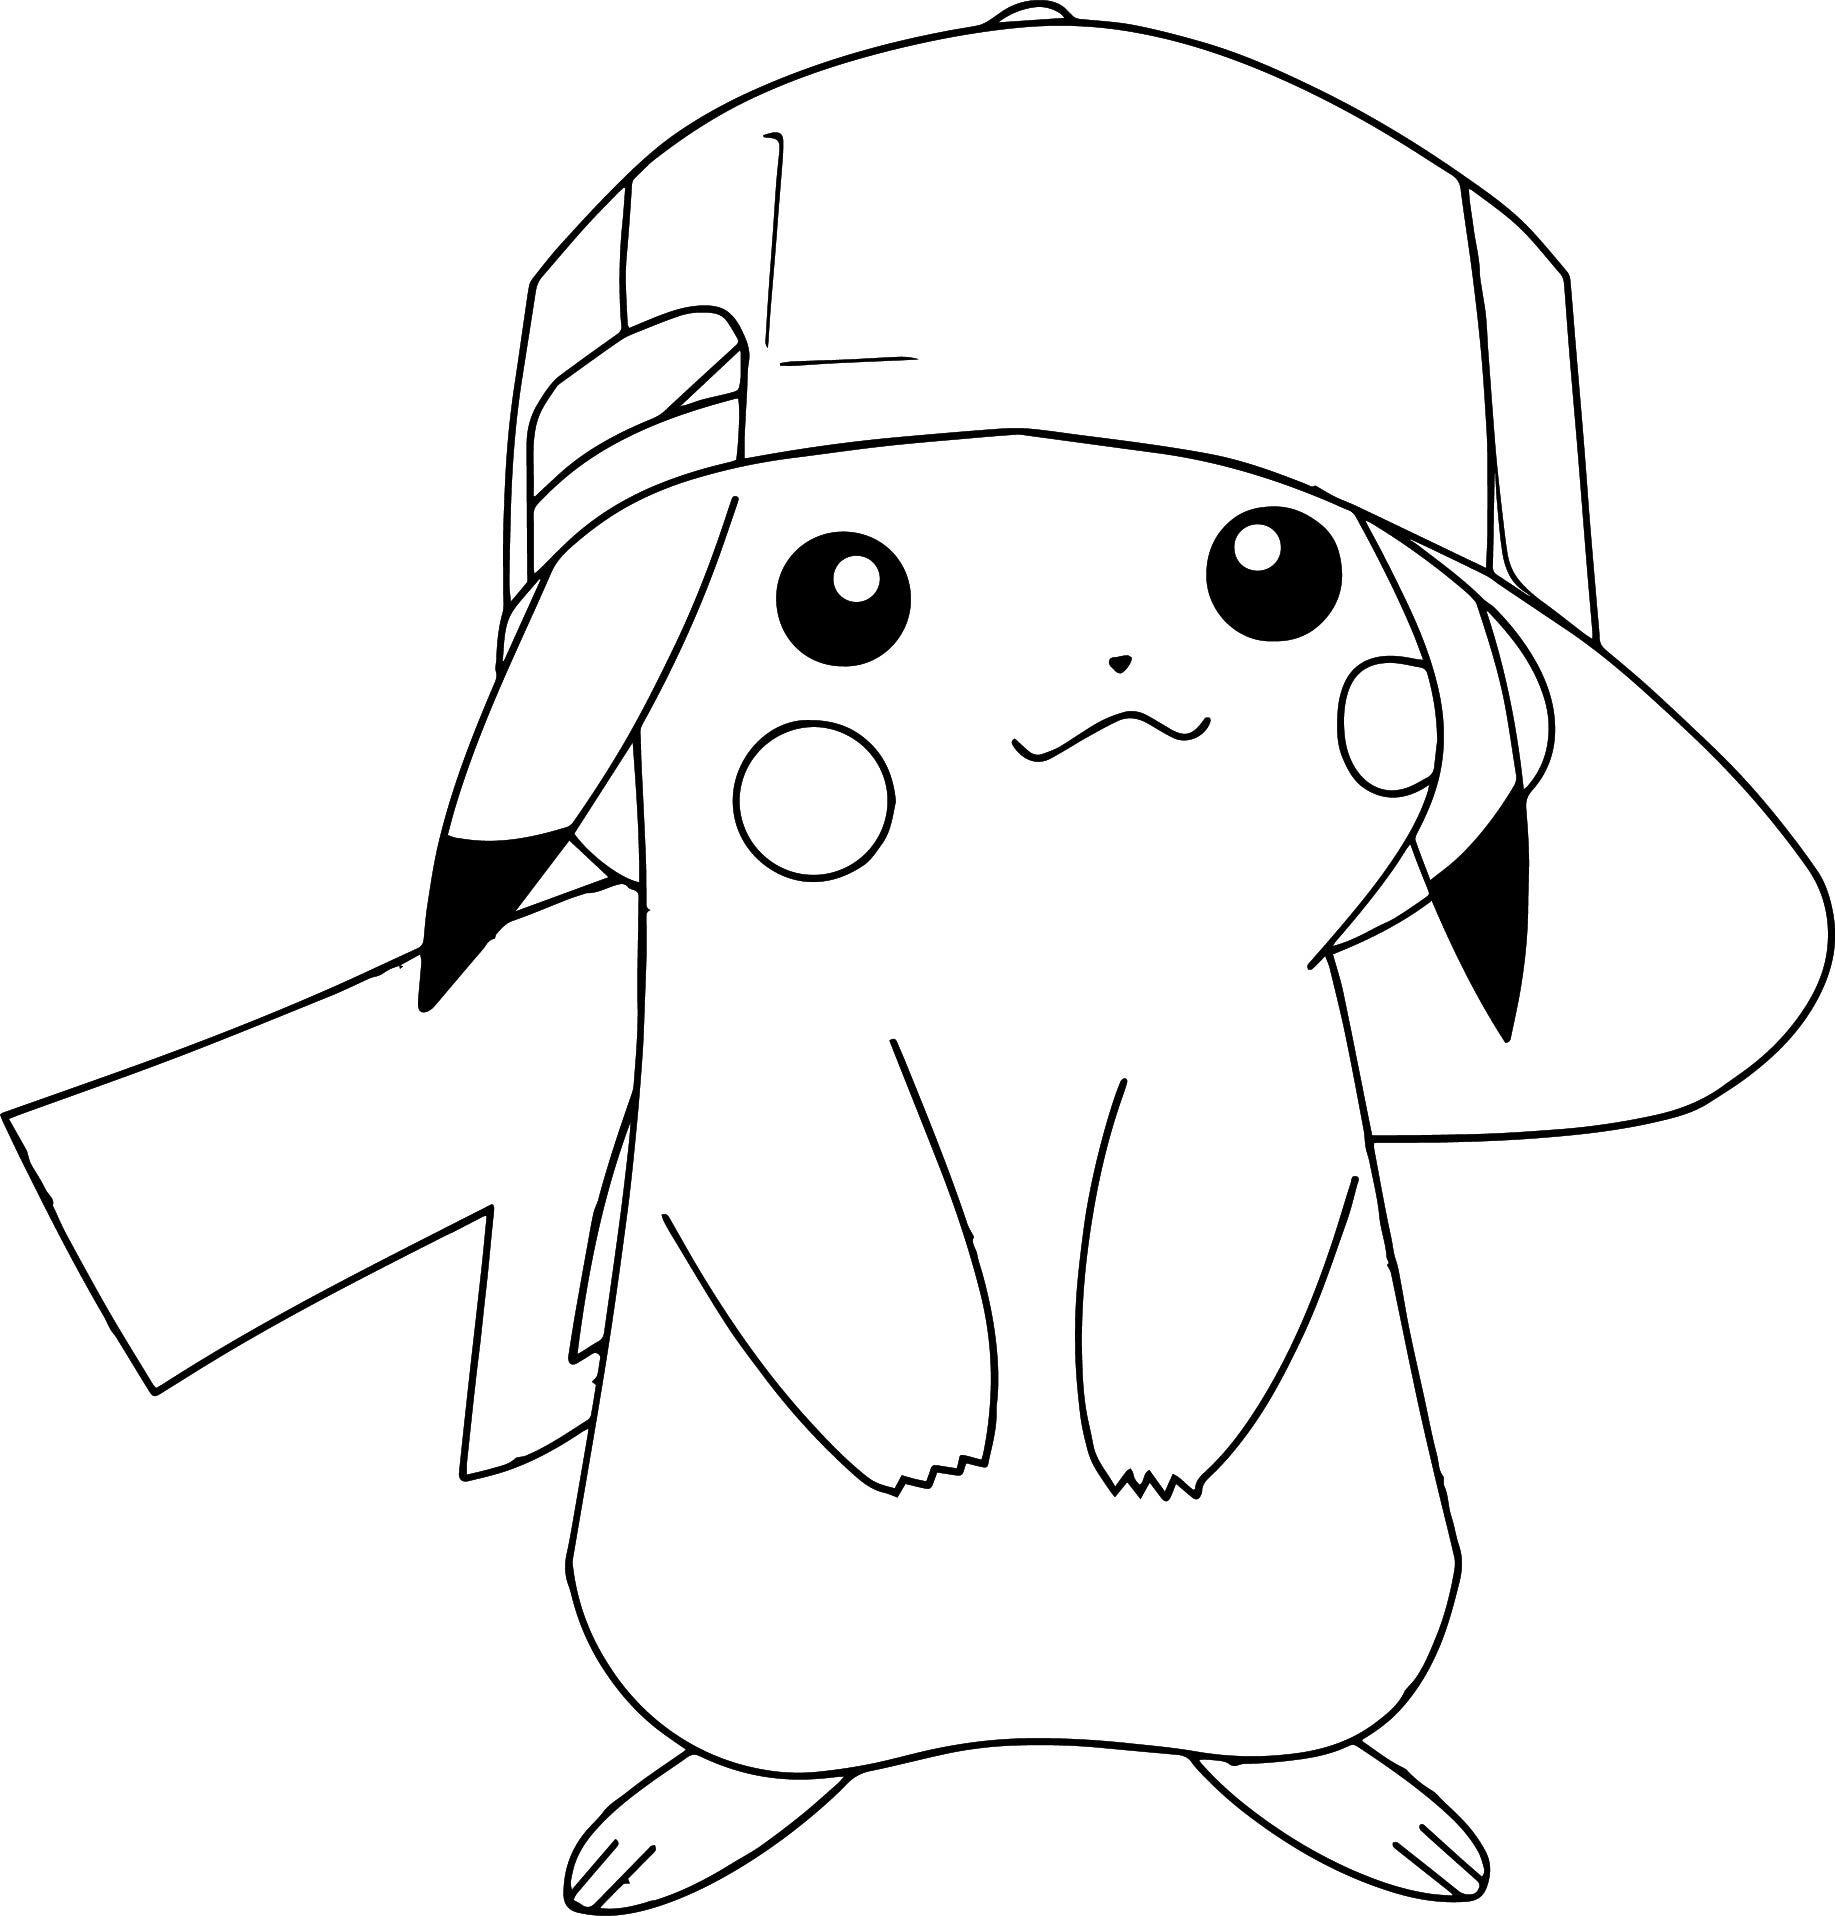 Pikachu Coloring Pages Pikachu Printable Coloring Sheets Pokemon